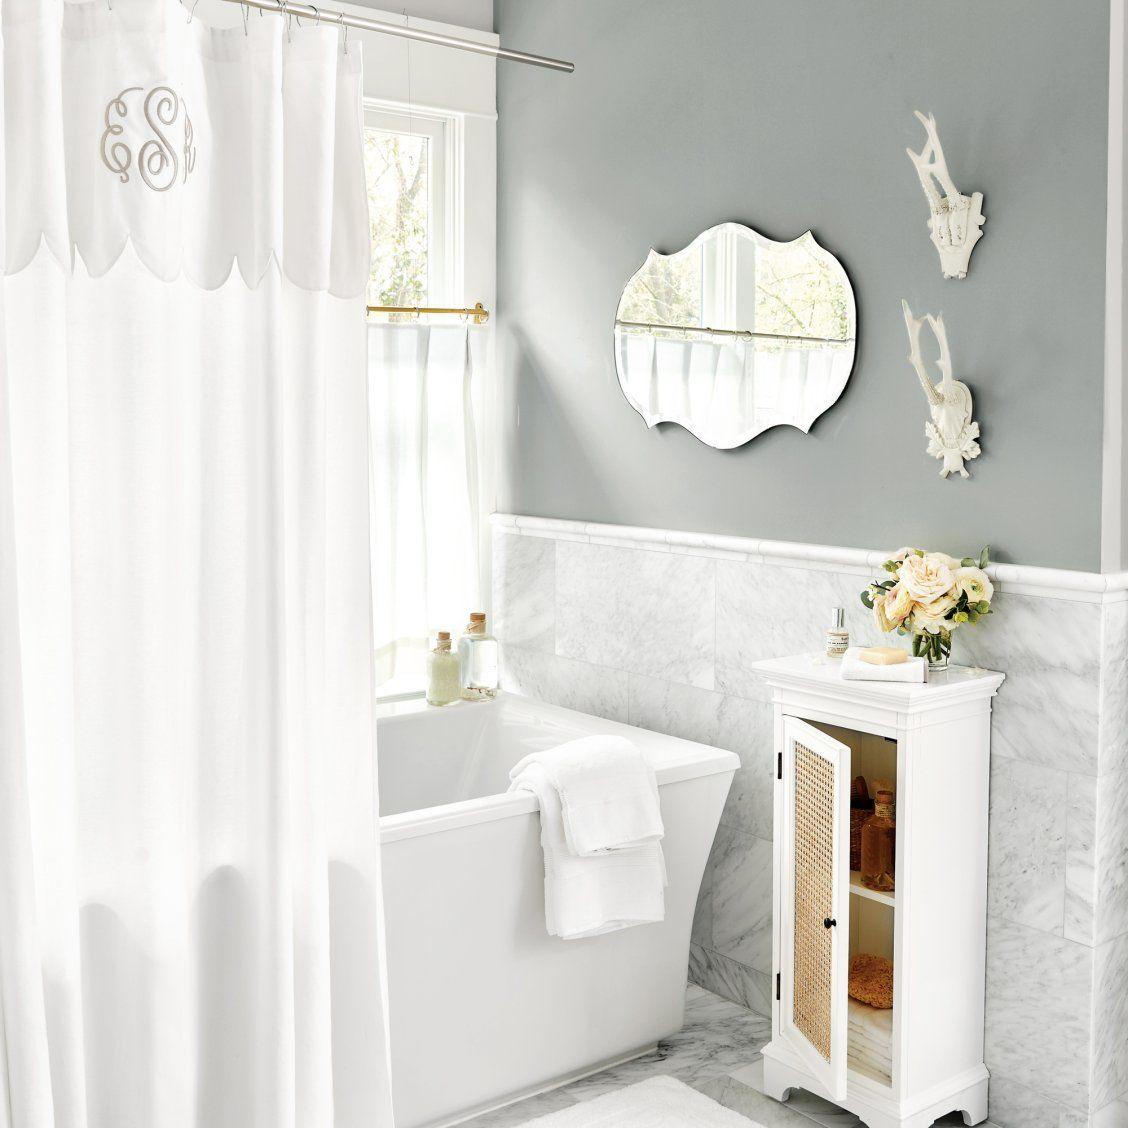 Emma White Scalloped Shower Curtain Beautiful Bathroom Decor